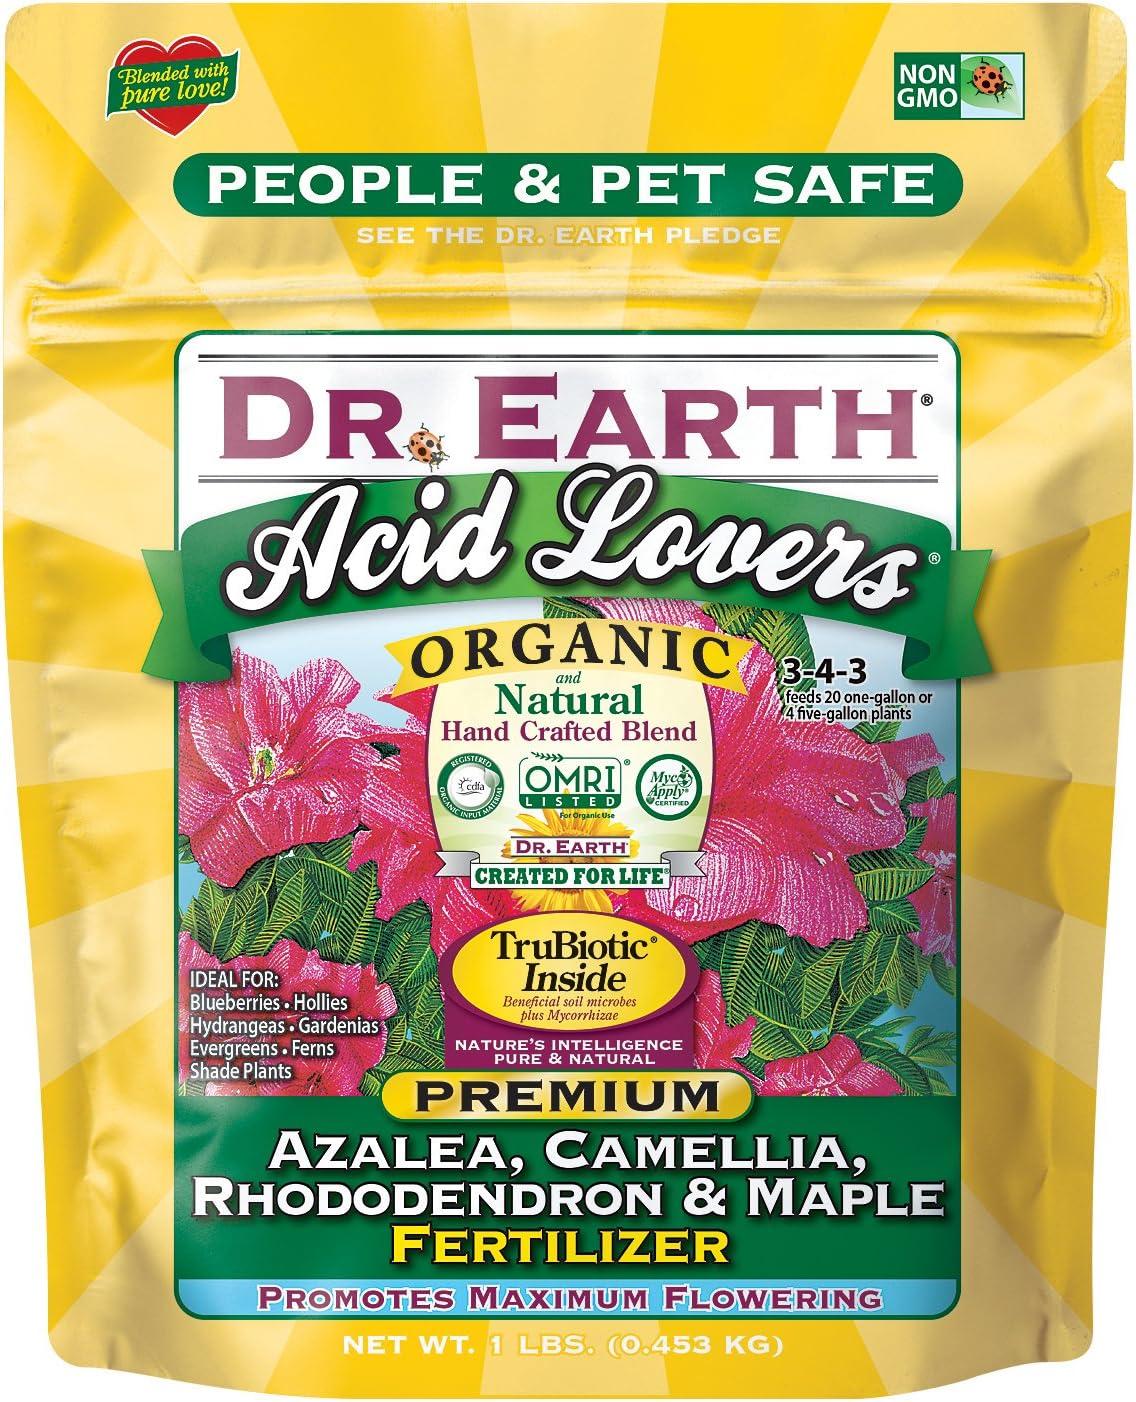 Dr. Earth Organic & Natural MINI Acid Lover Azalea, Camellia, Rhododendron & Maple Fertilizer ( 1 lbs )